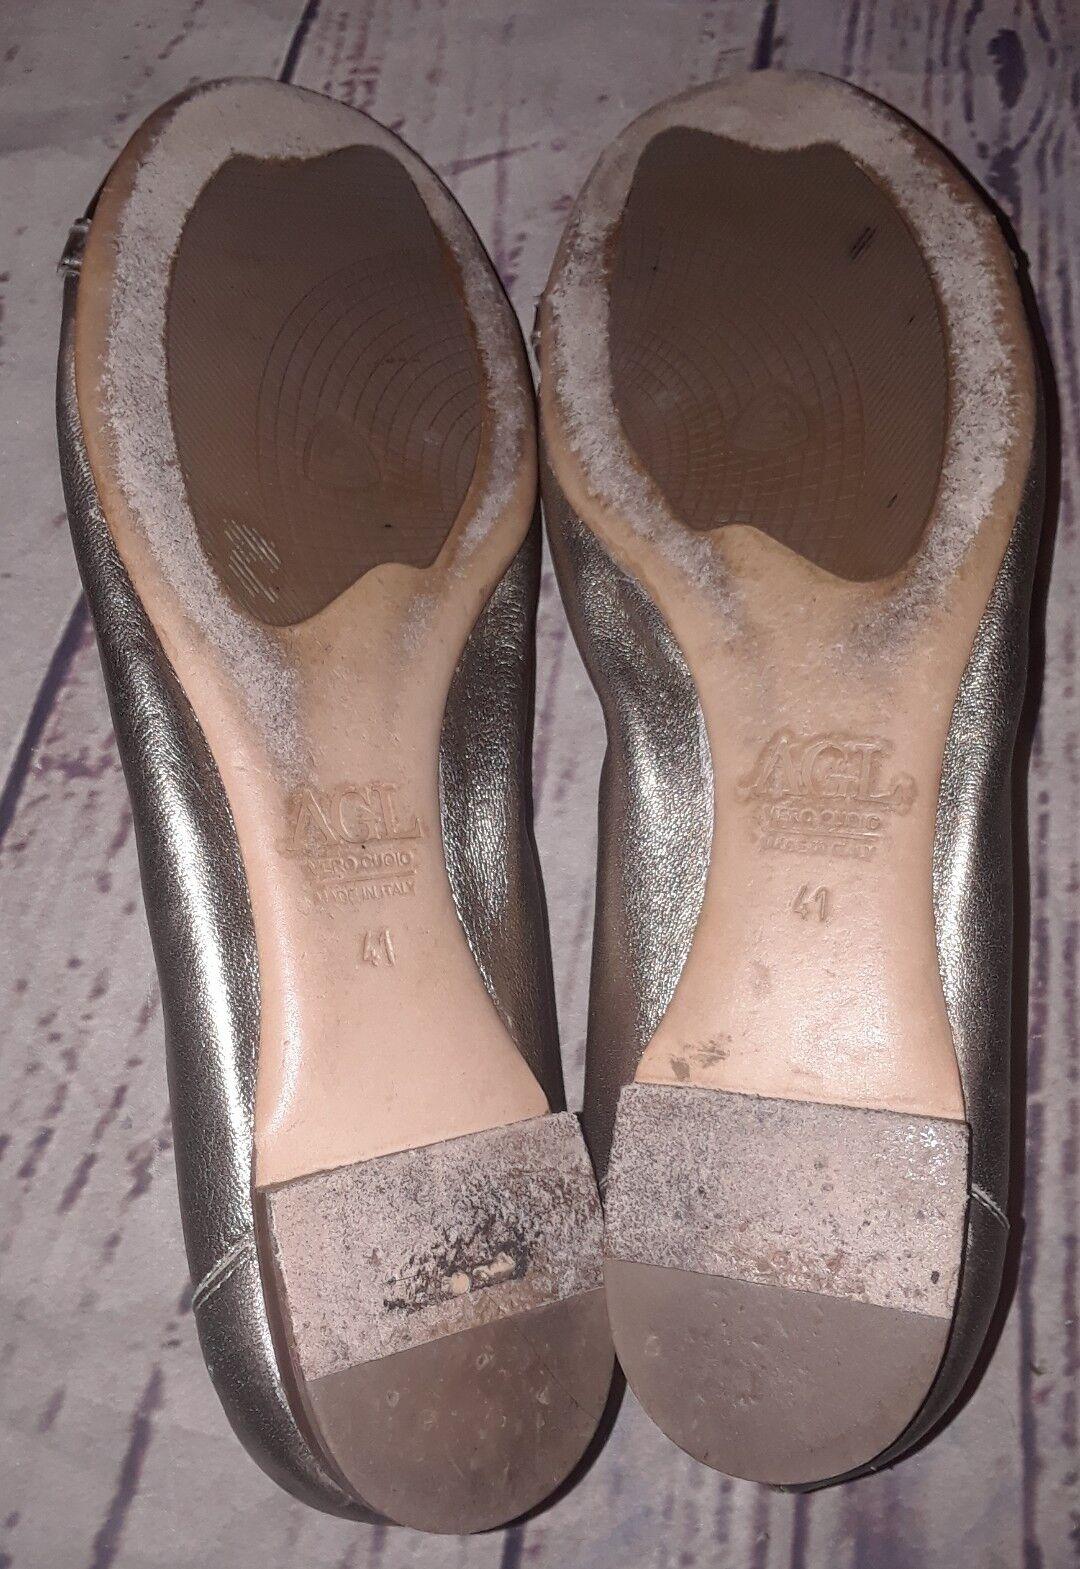 Attilio Giusti Leombruni AGL schwarz Gold Gold Gold leather Cap Toe ballerina flats 41 ce413b